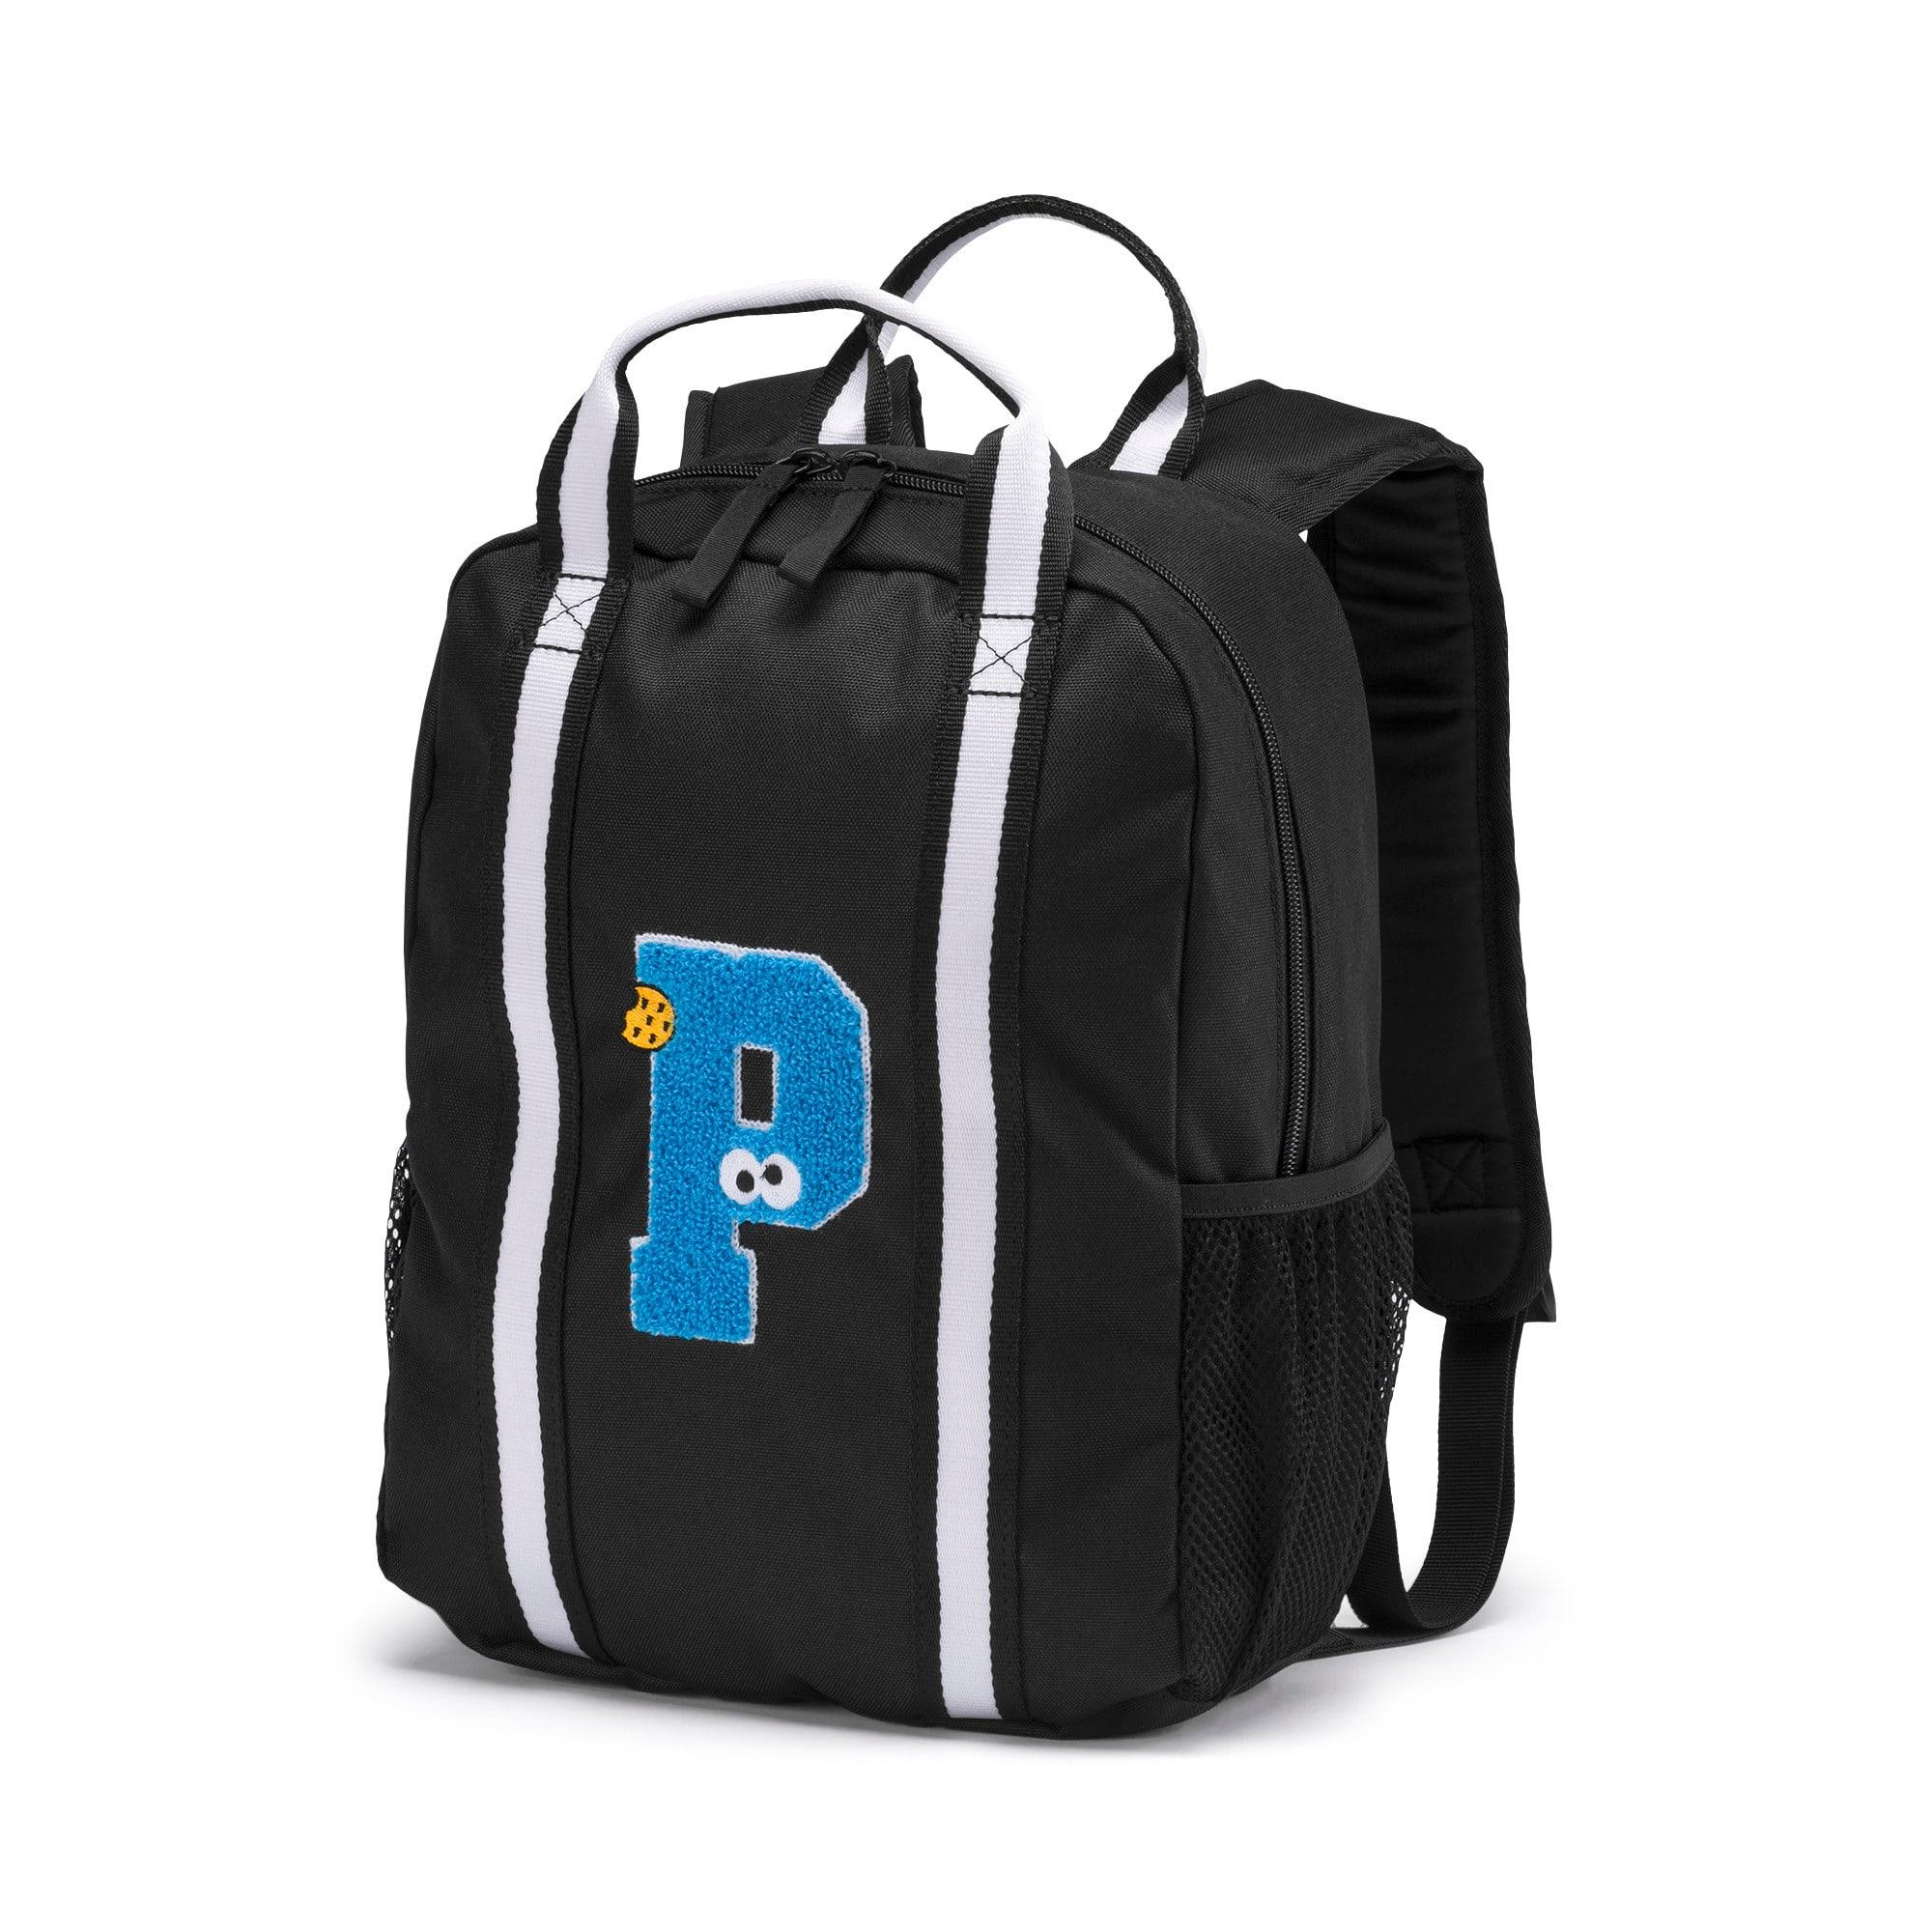 Thumbnail 1 of Sesame Street Kids' Backpack, Puma Black, medium-IND